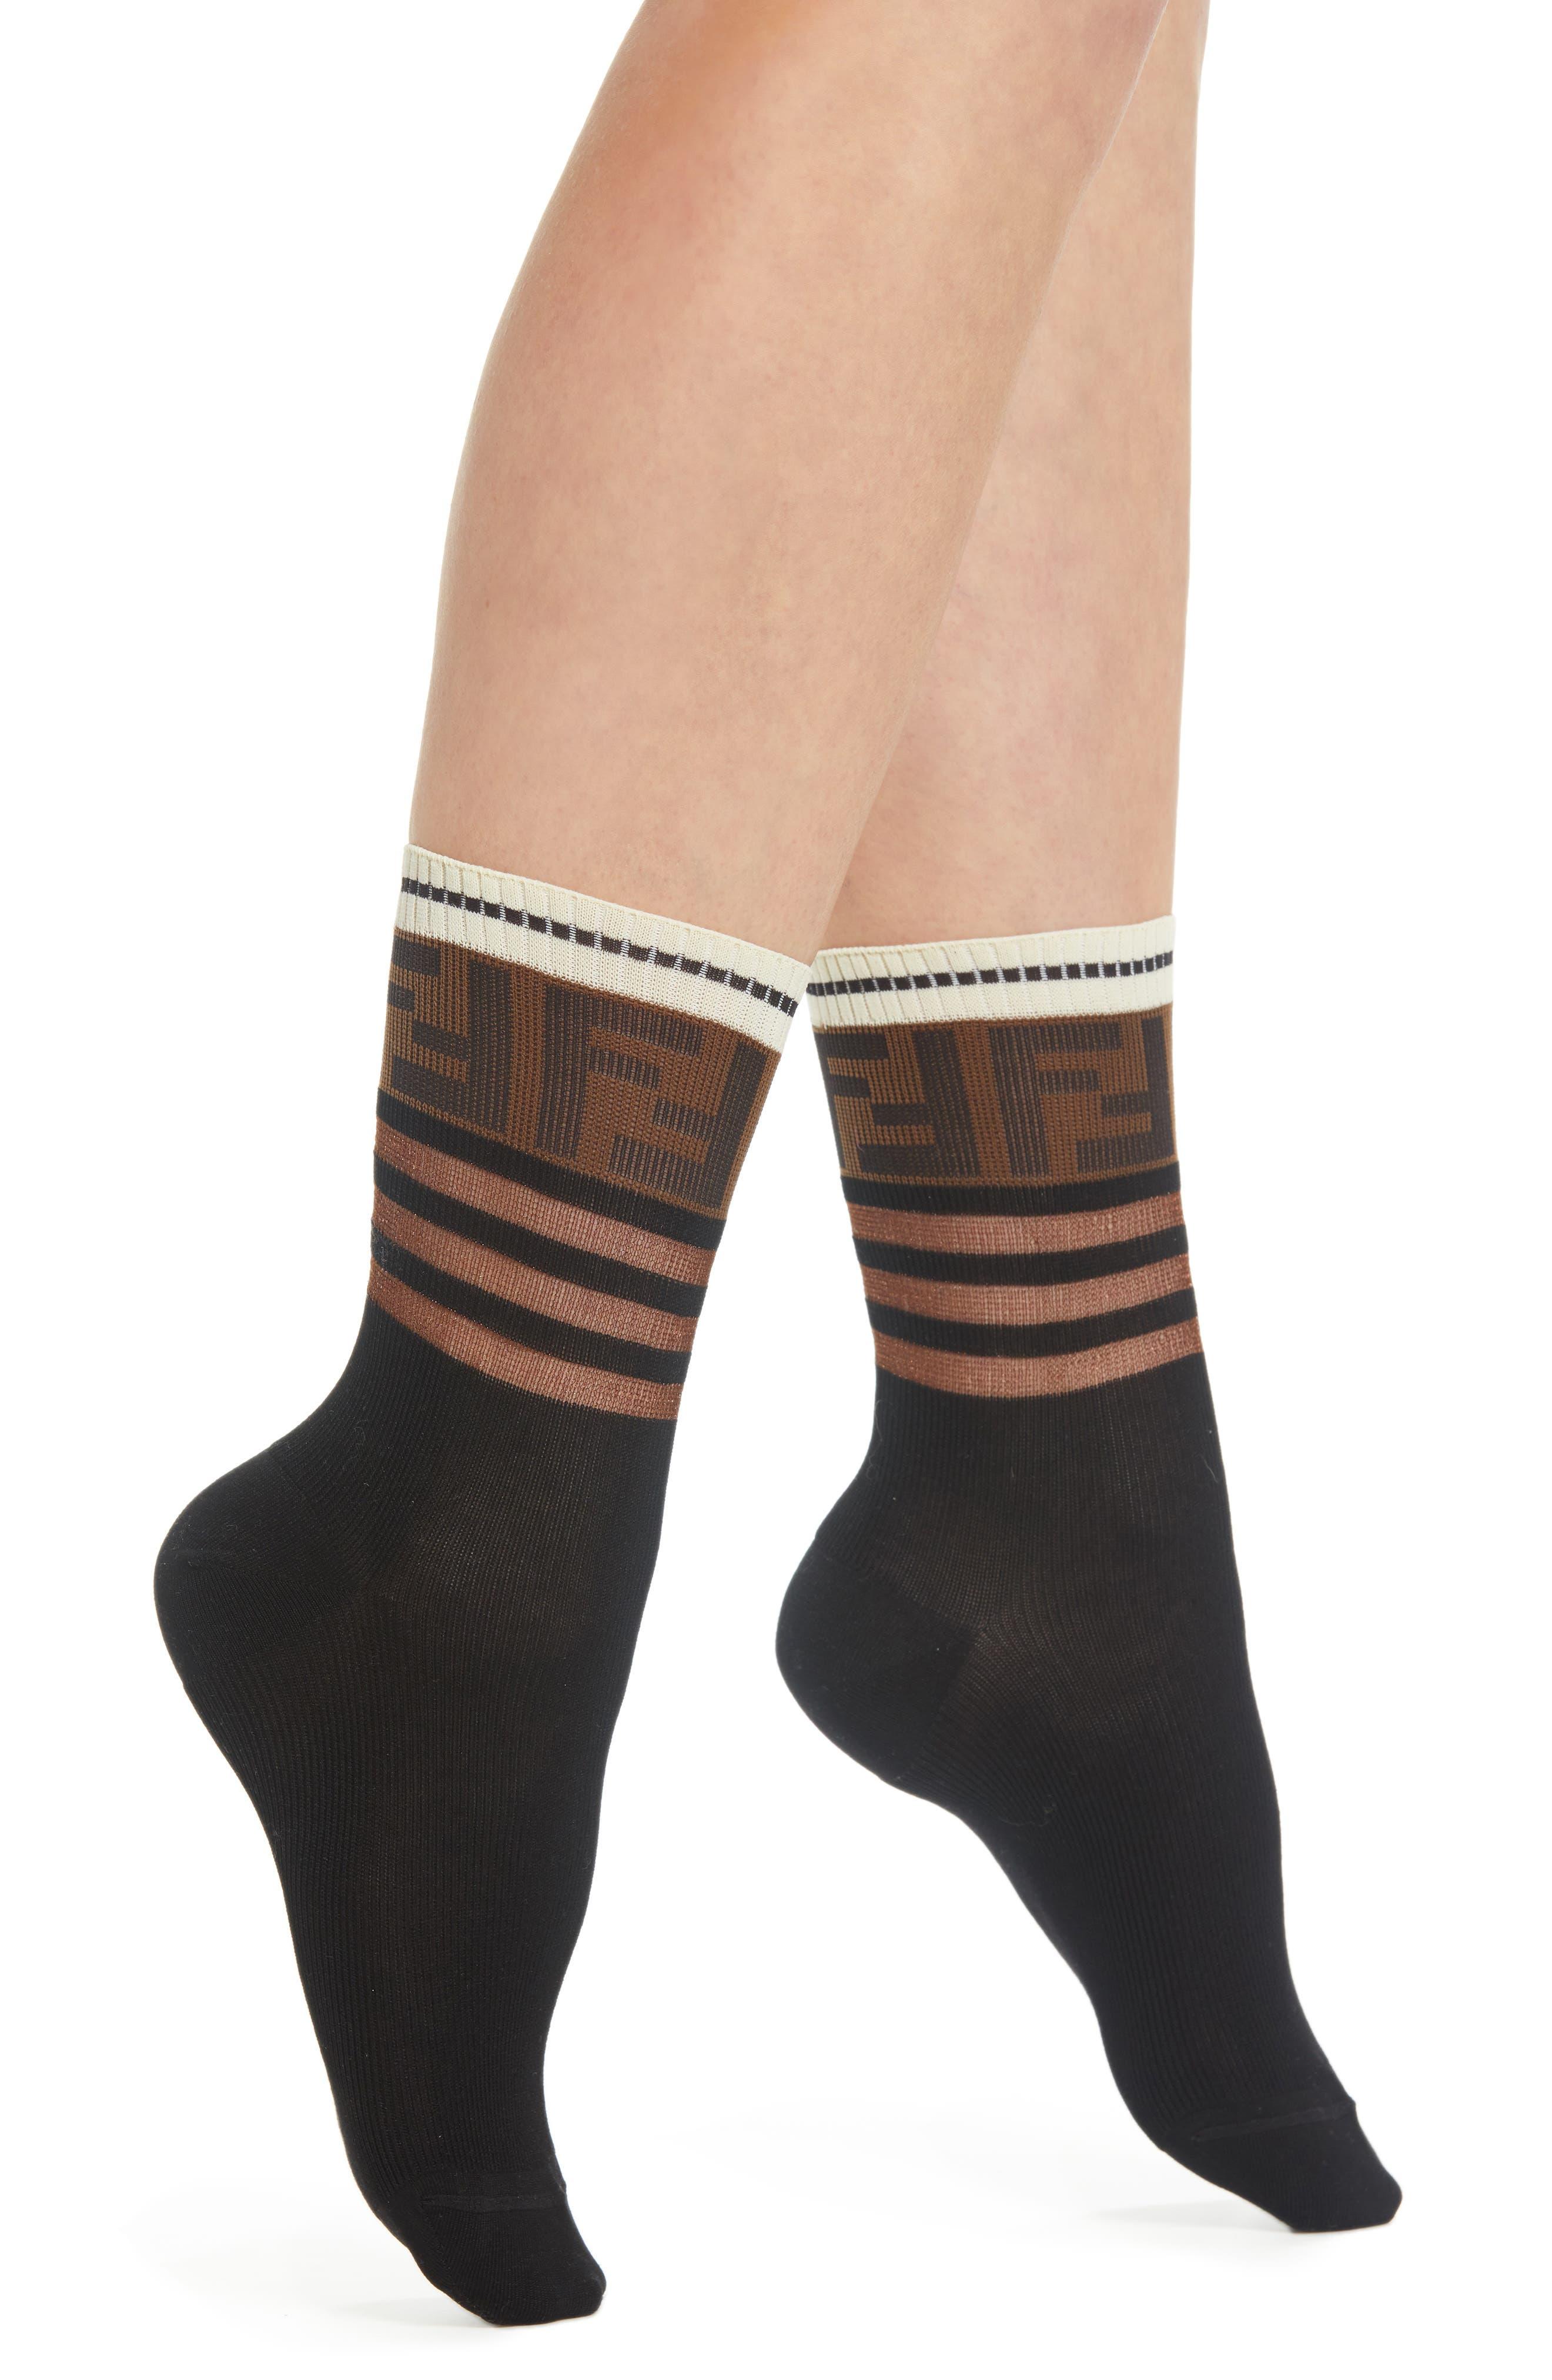 FENDI, Touch of Double F Socks, Main thumbnail 1, color, BLACK